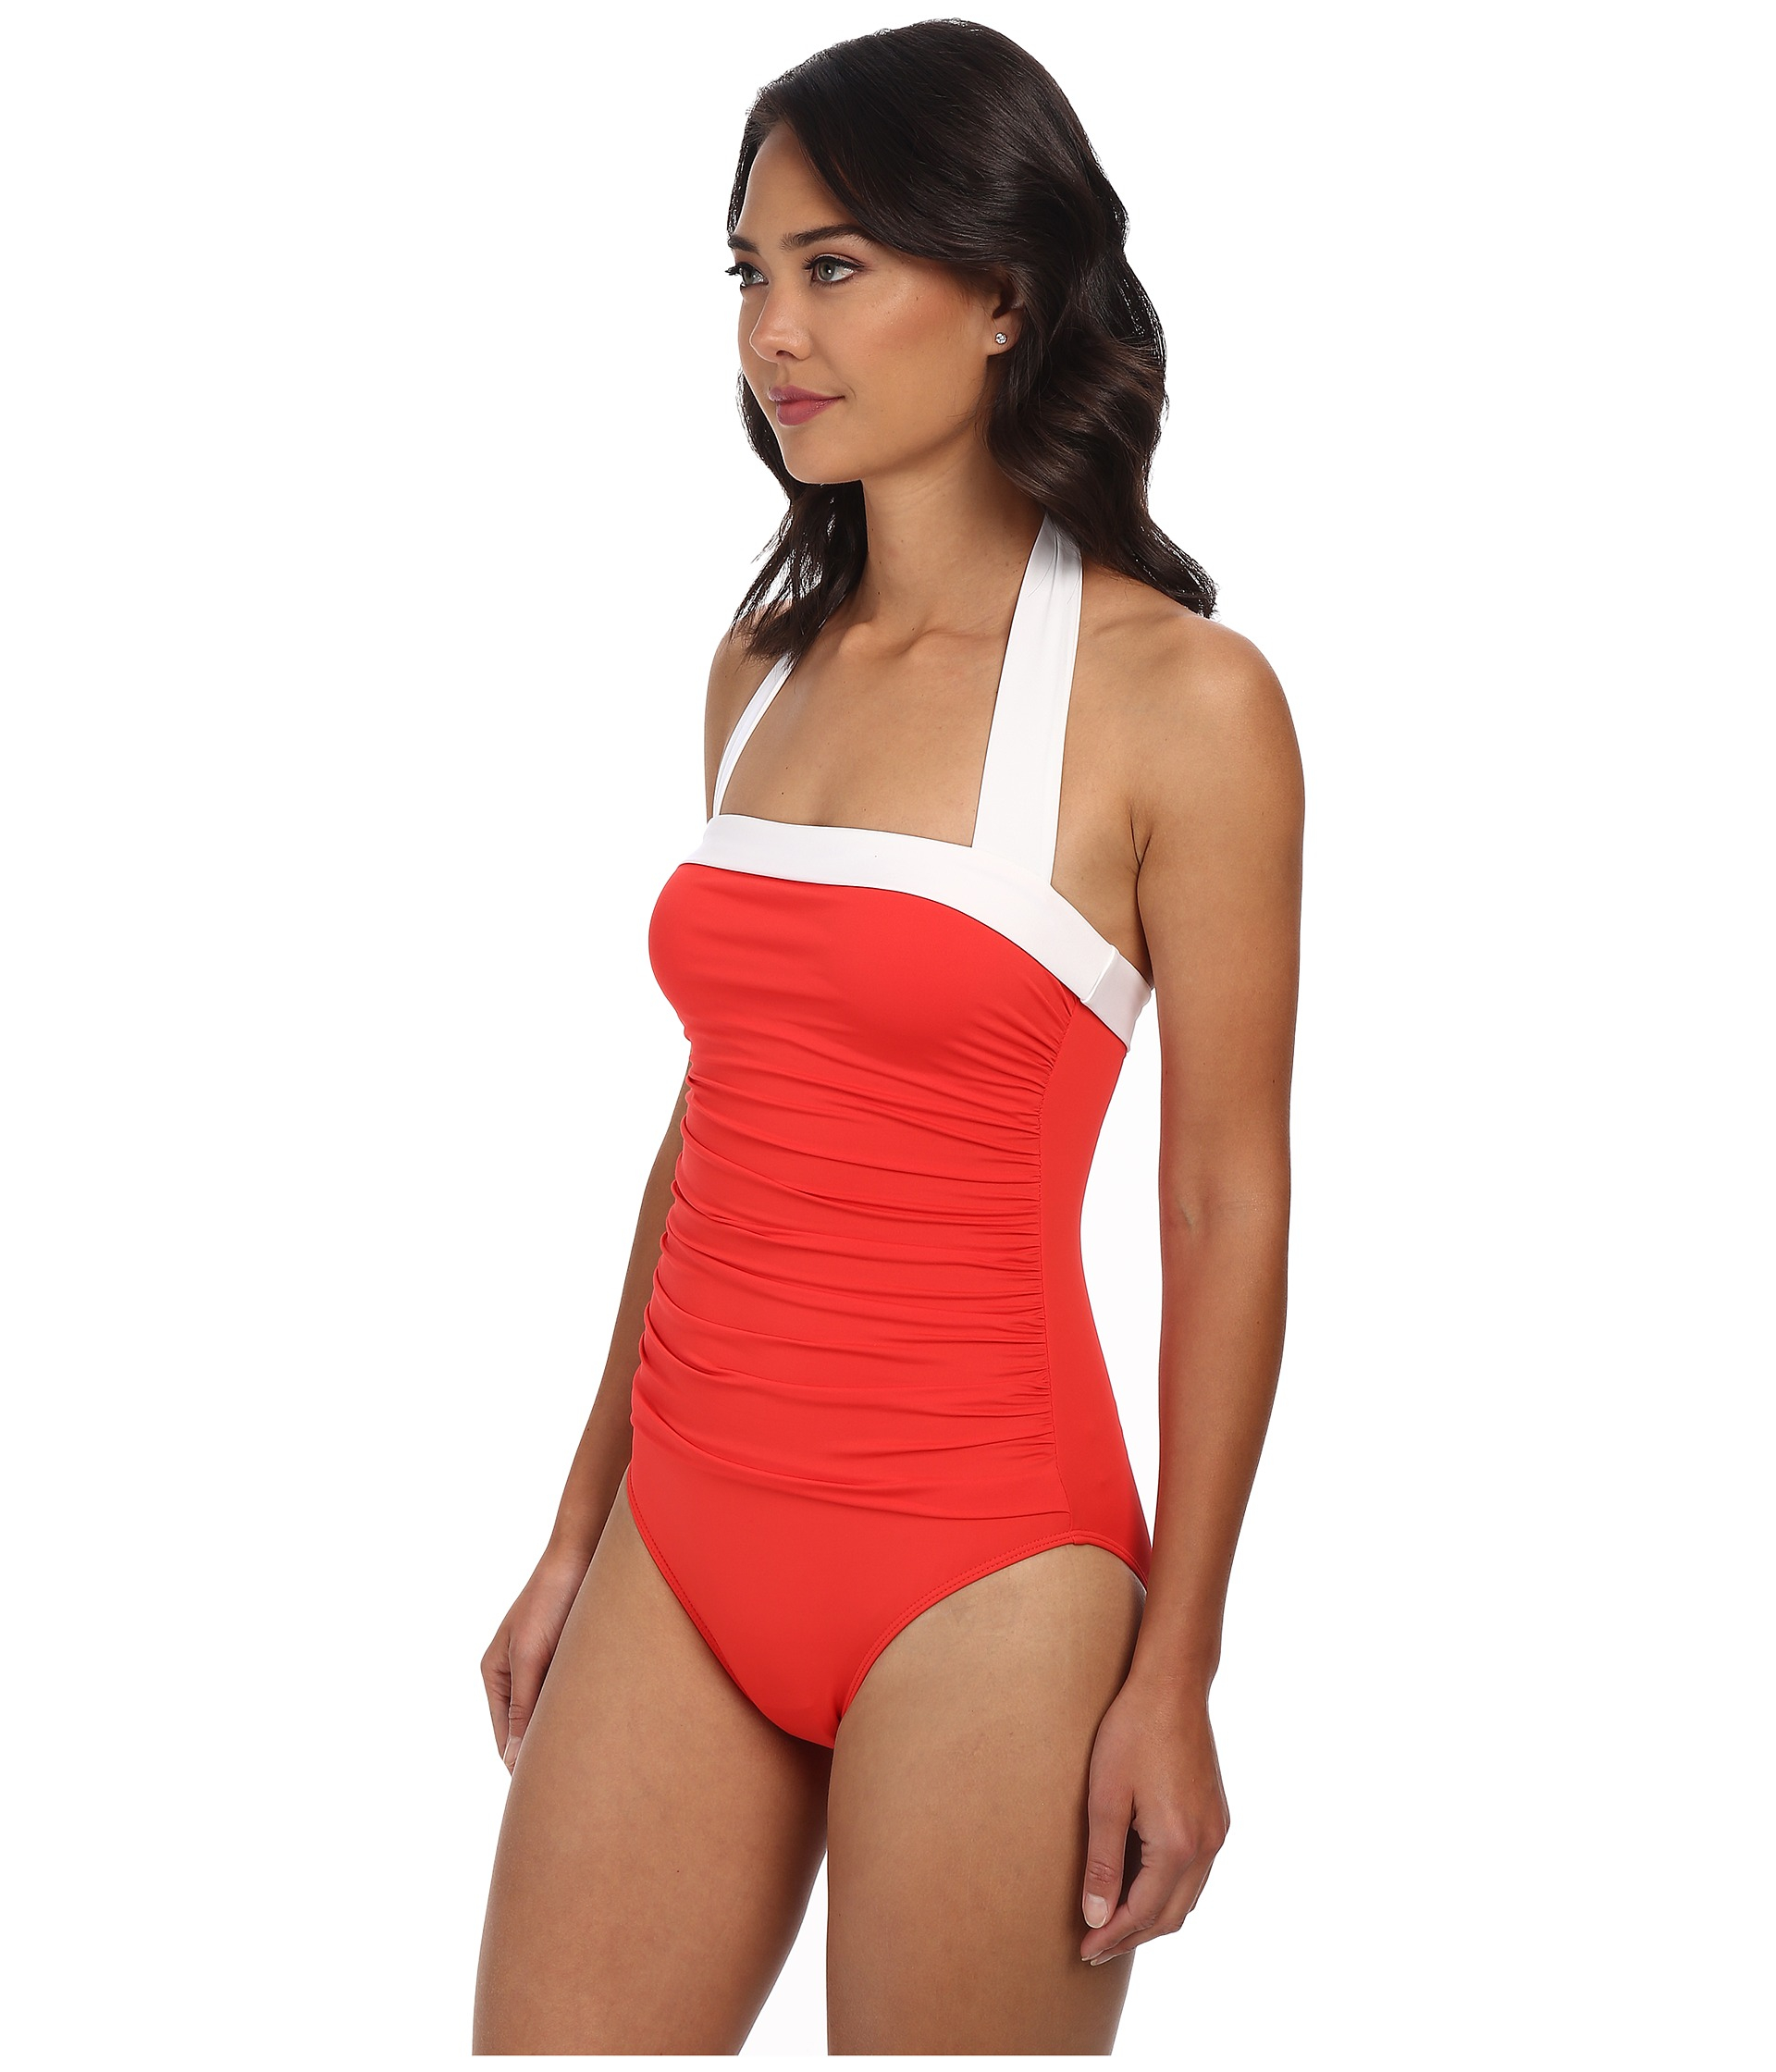 972a92203b707 Swimwear, Surfwear & Wetsuits Lauren by Ralph Lauren Bel Aire Slimming Fit  One Shoulder One Piece Swimsuit